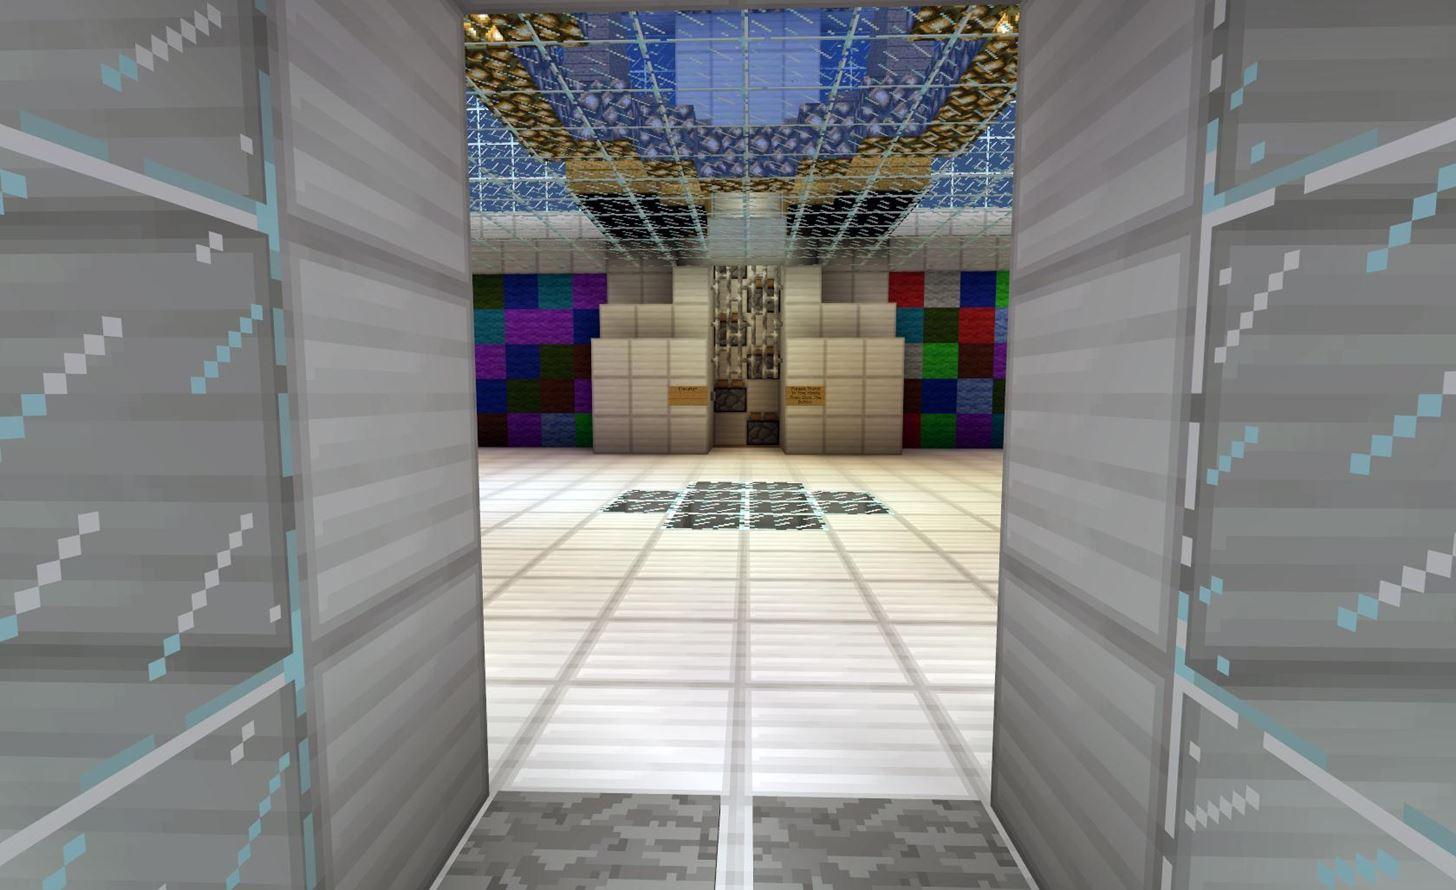 Winners of Minecraft World's Weekly Staff Choice Awards: Week 3